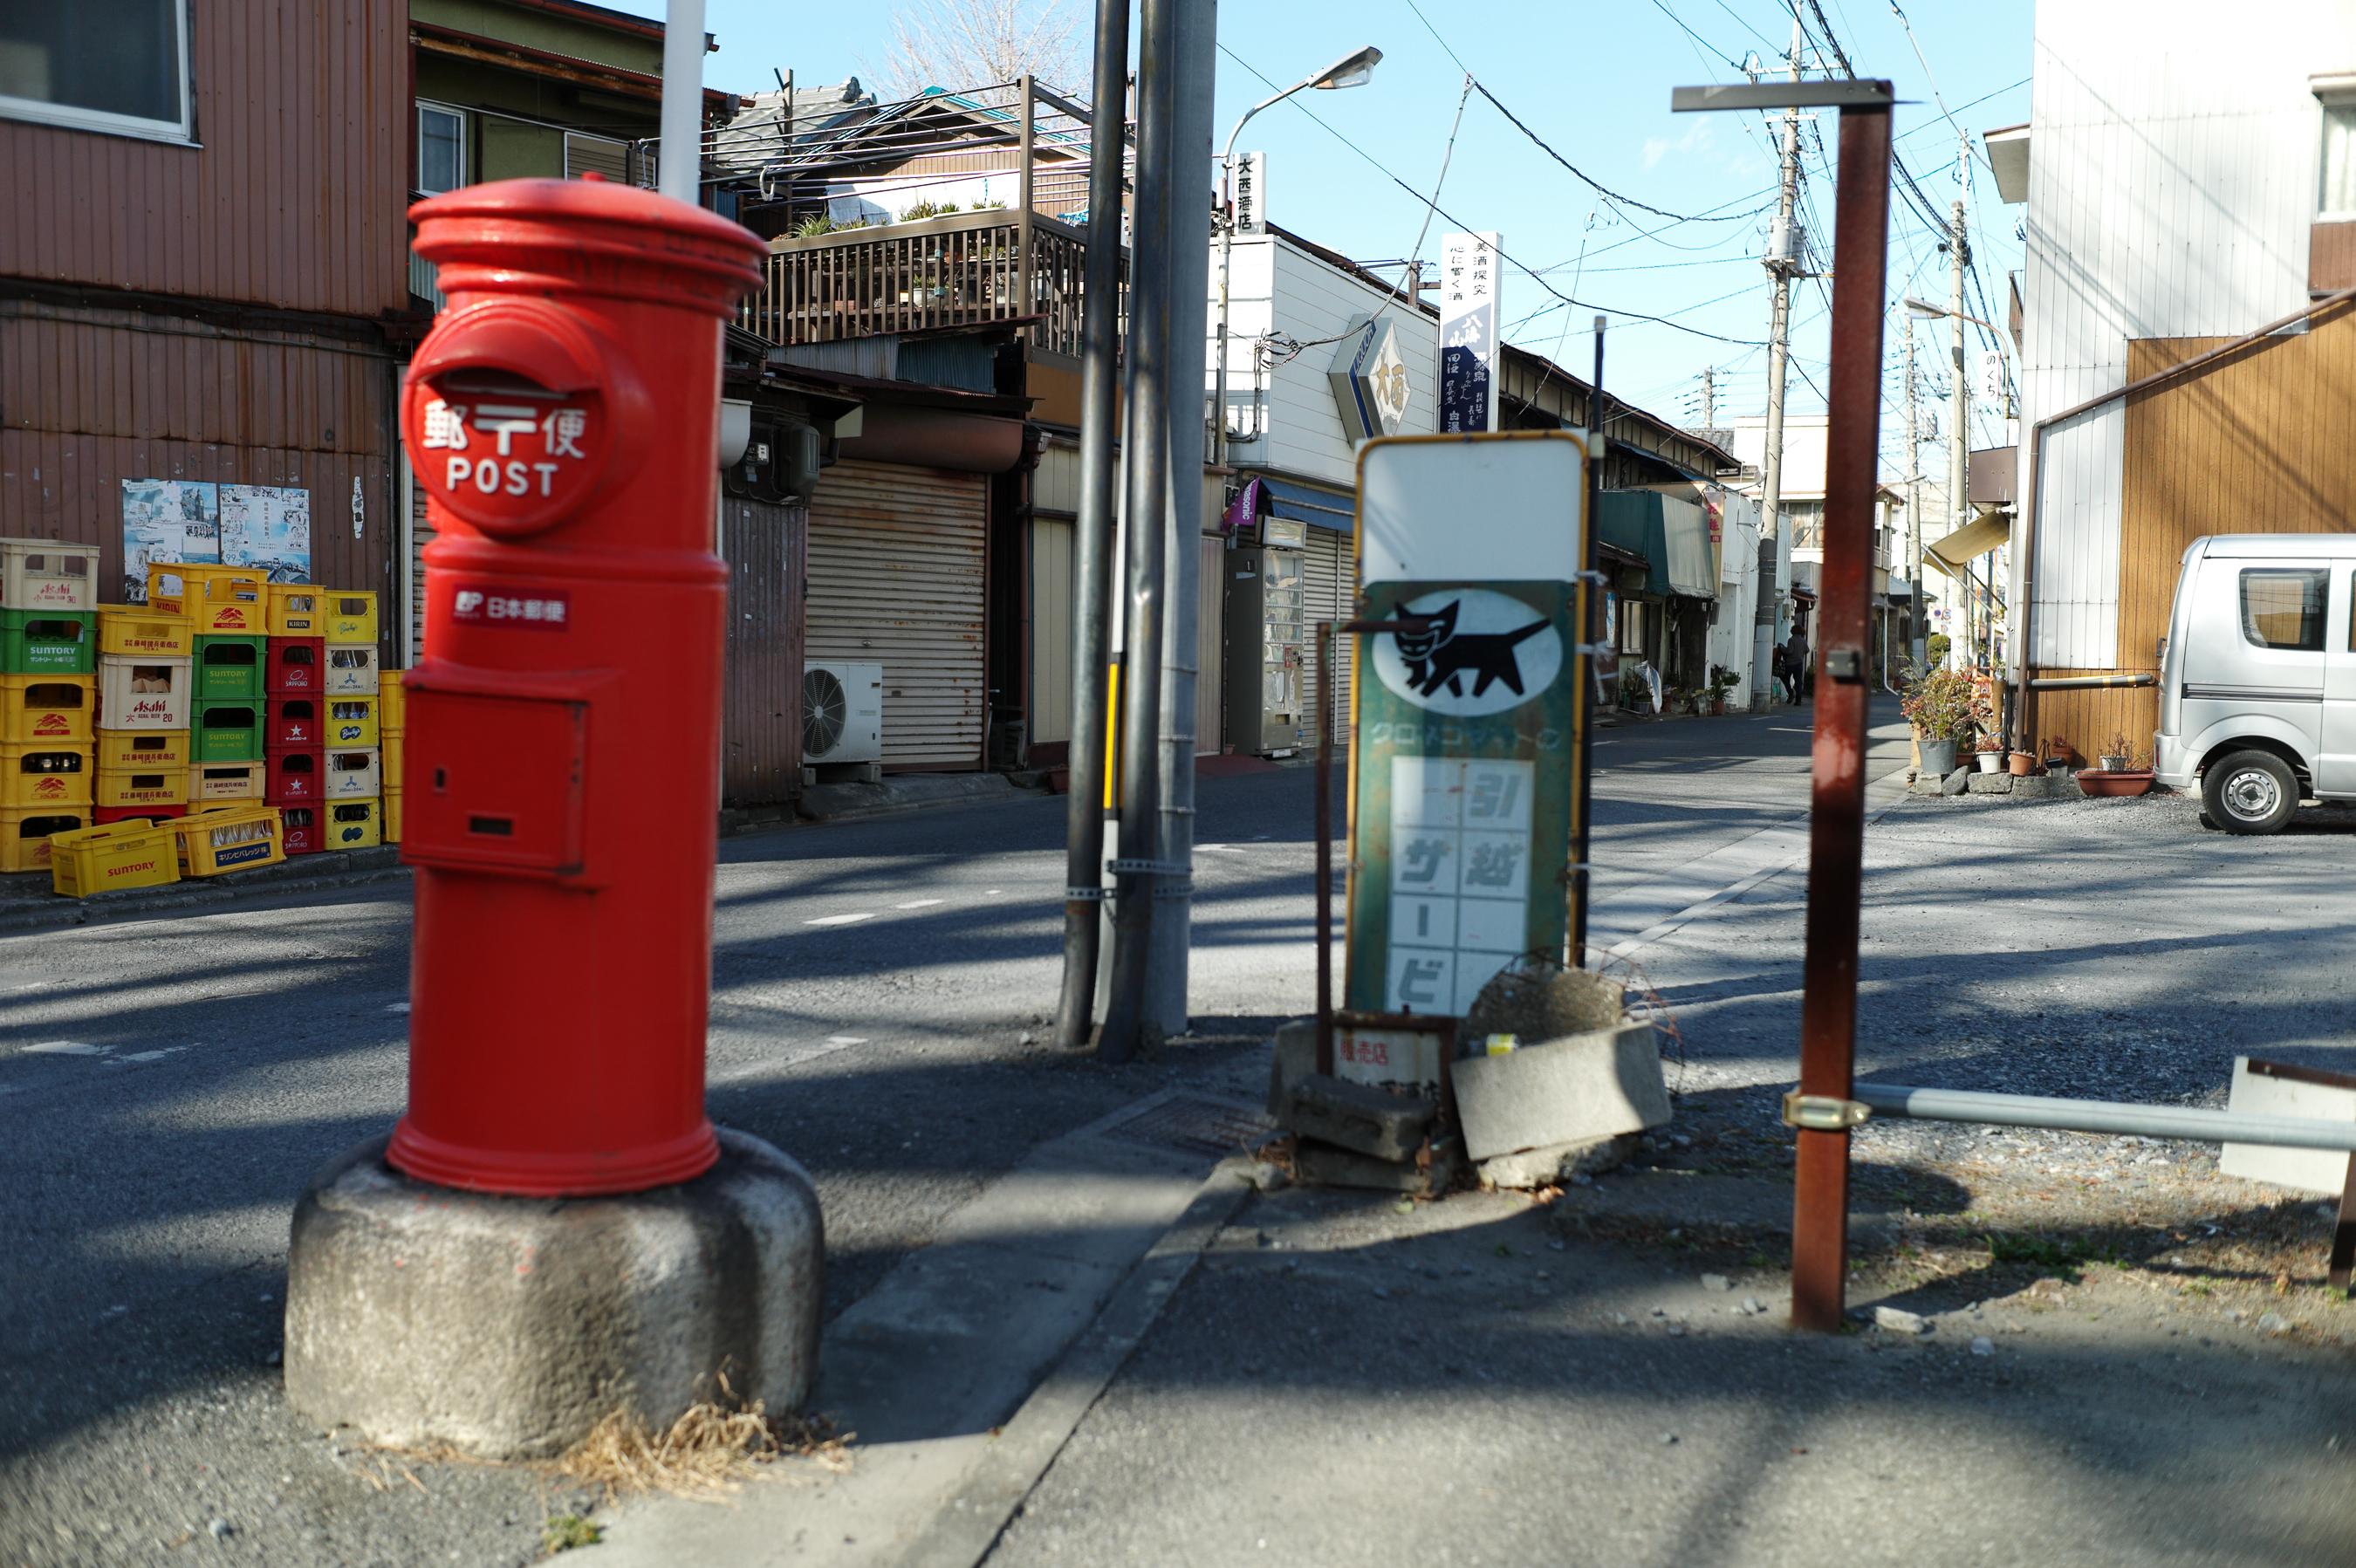 f:id:aoyama-takuro:20180211225624j:plain